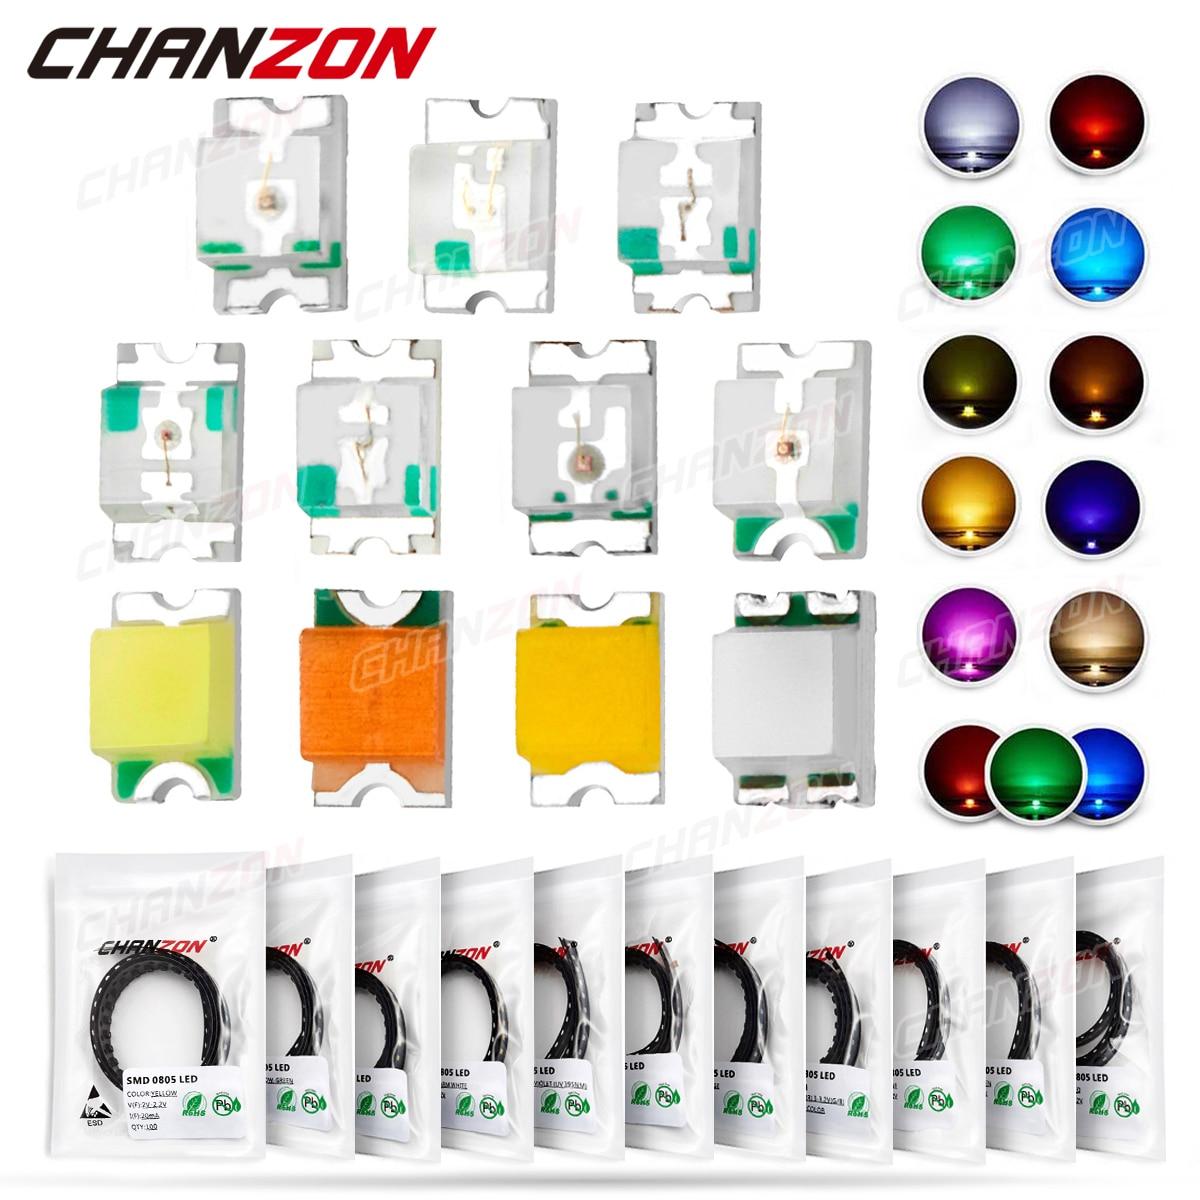 SMD LED Lamp-Chip Emitting-Diode-Kit Orange SMT Micro Yellow Green 0805 100pcs Light-Beads